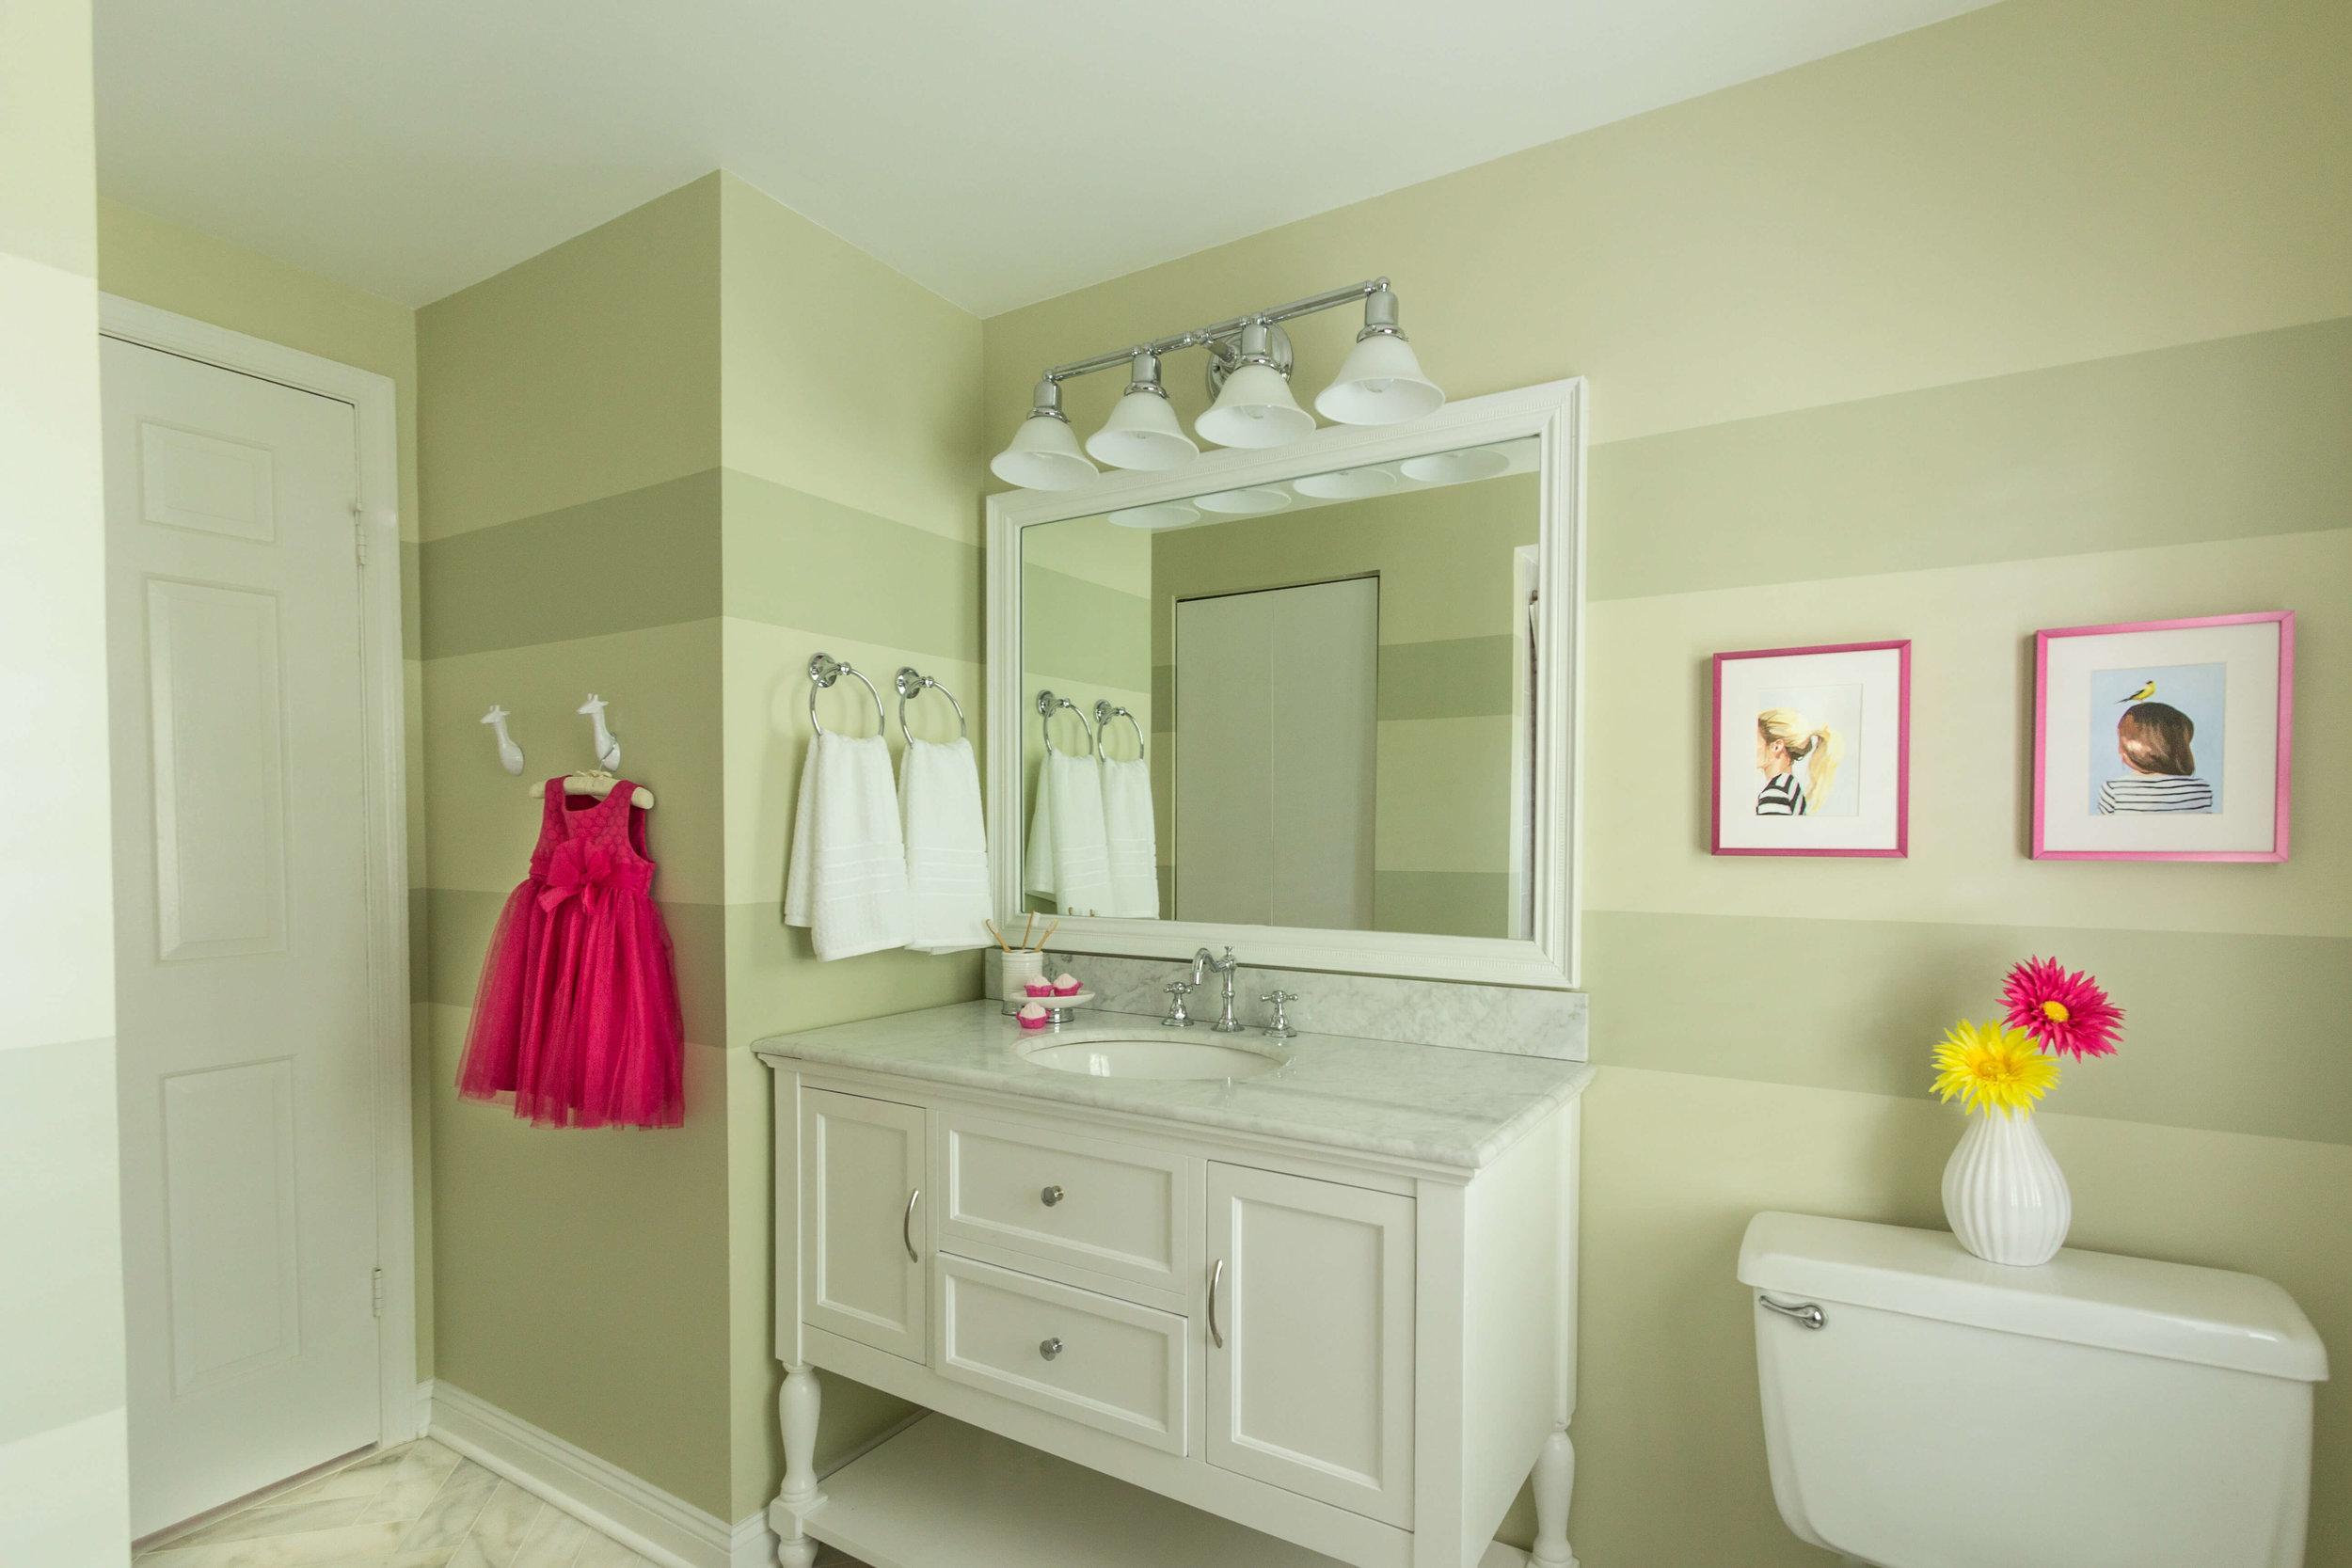 Little Girl's Bathroom -